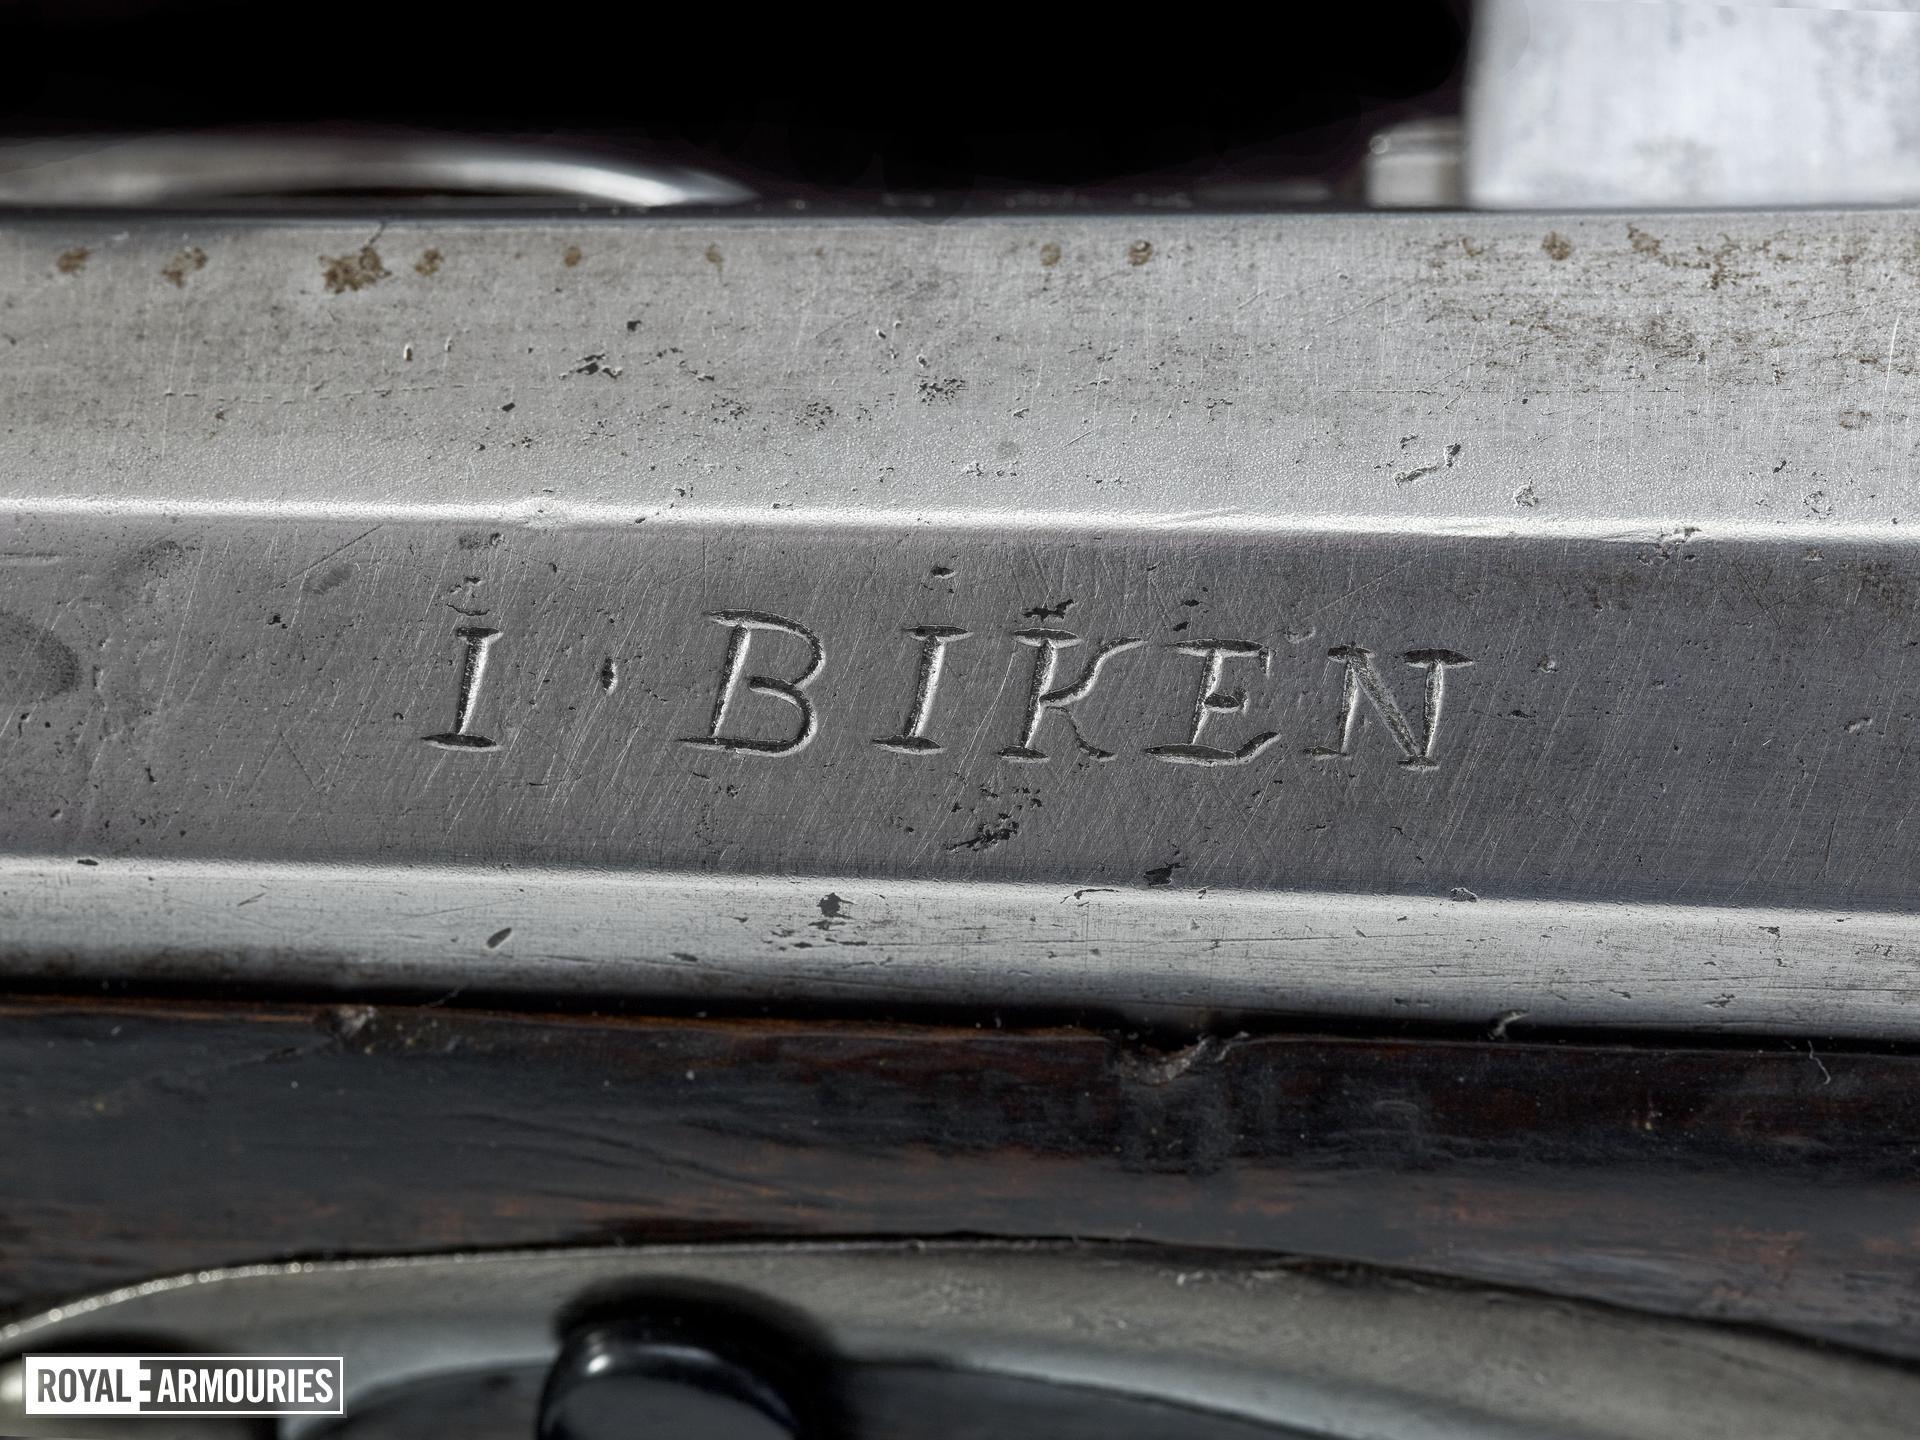 Matchlock muzzle-loading musket - By Biken